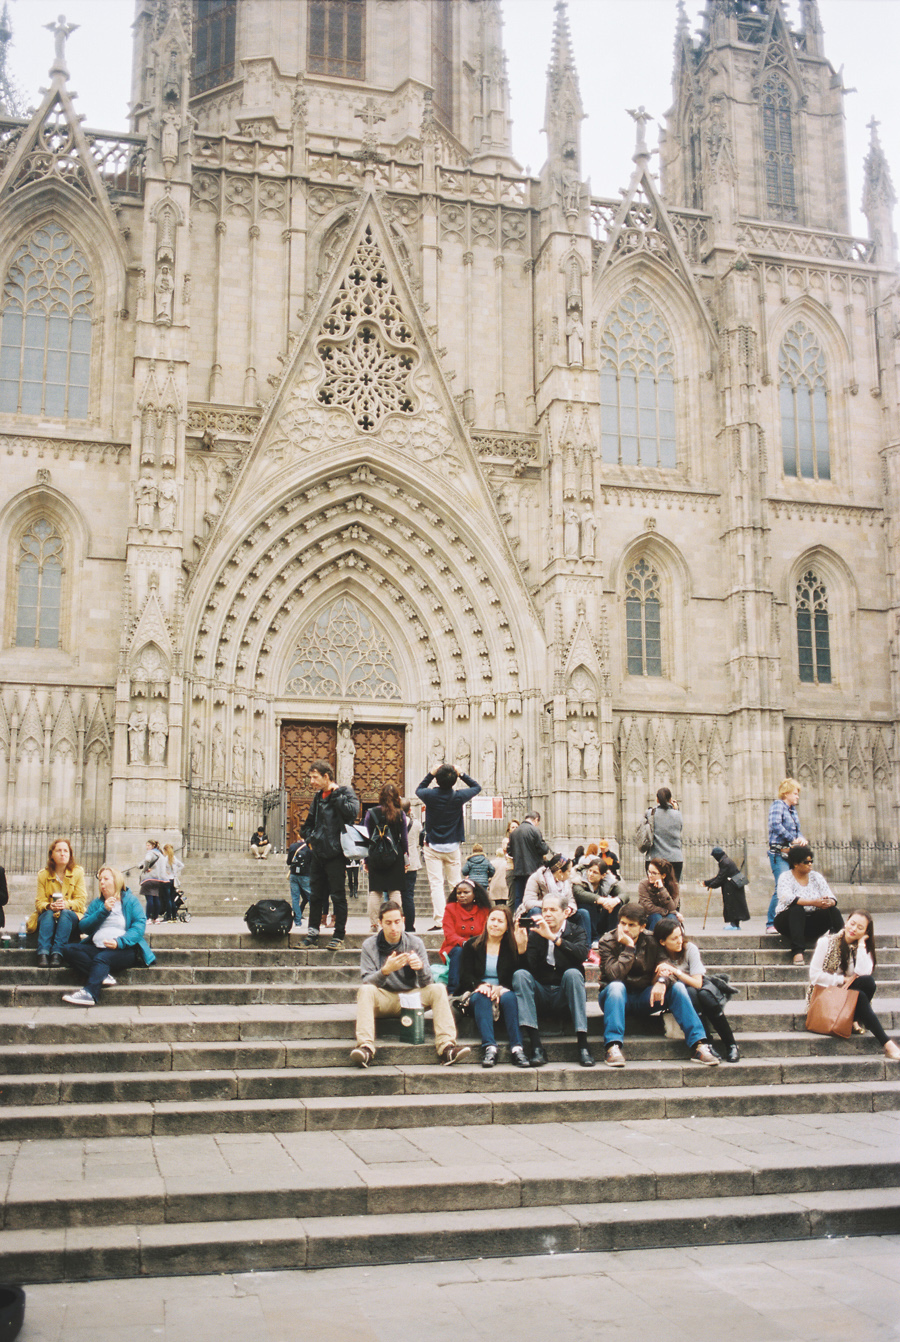 010-barcelona.jpg